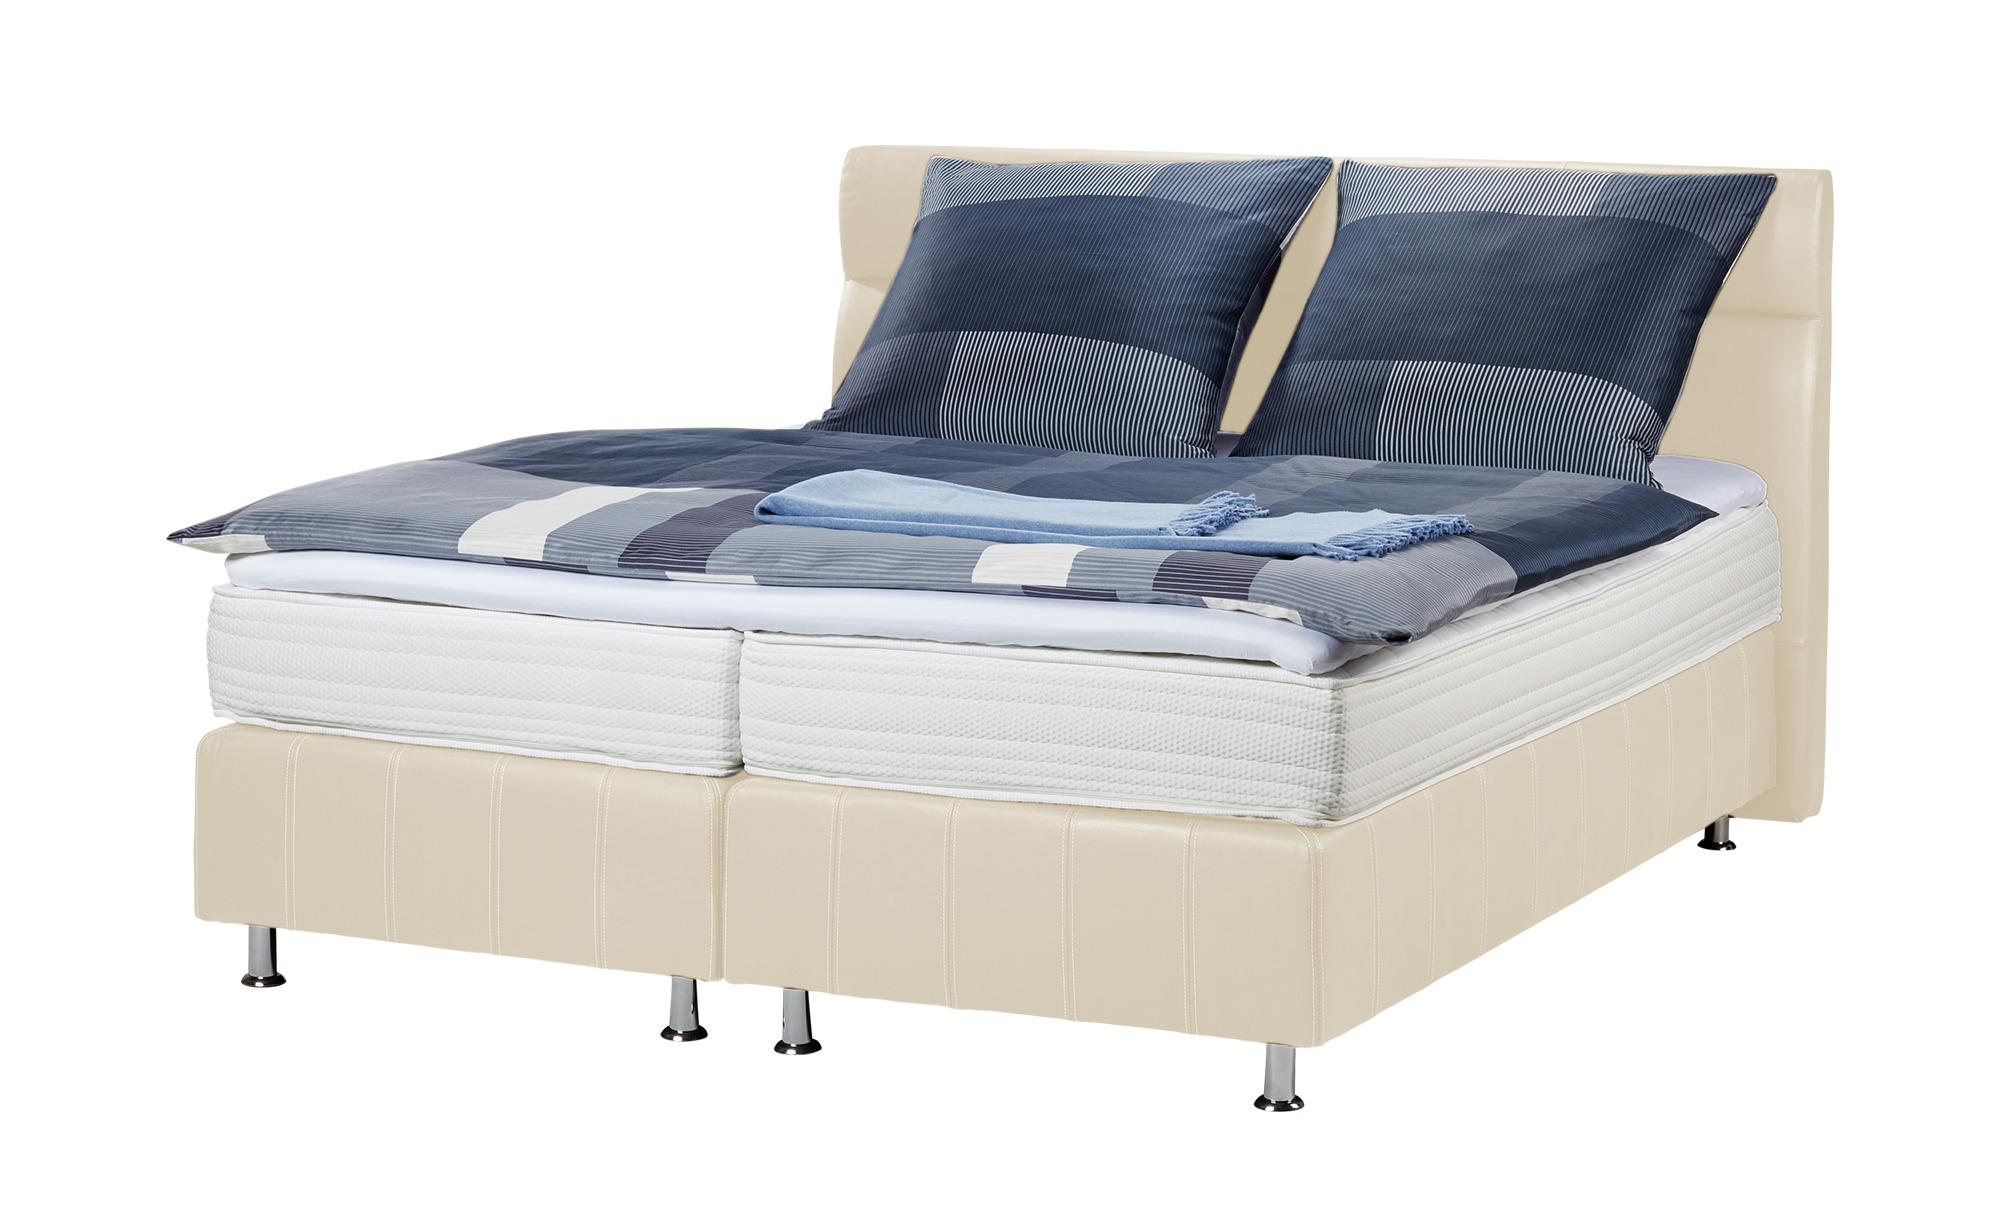 Boxspringbett - beige - 150 cm - 114 cm - Betten > Boxspringbetten - Möbel Kraft | Schlafzimmer > Betten > Boxspringbetten | Beige | Sconto